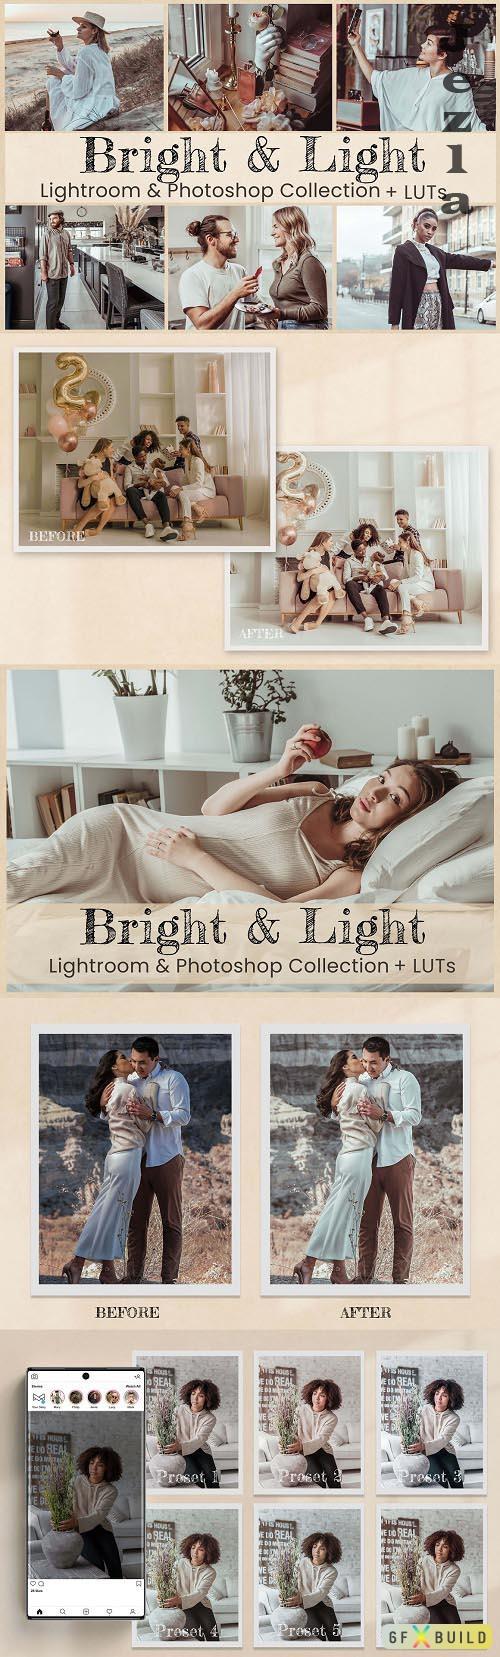 Bright Light Lightroom Photoshop LUT - 6524061